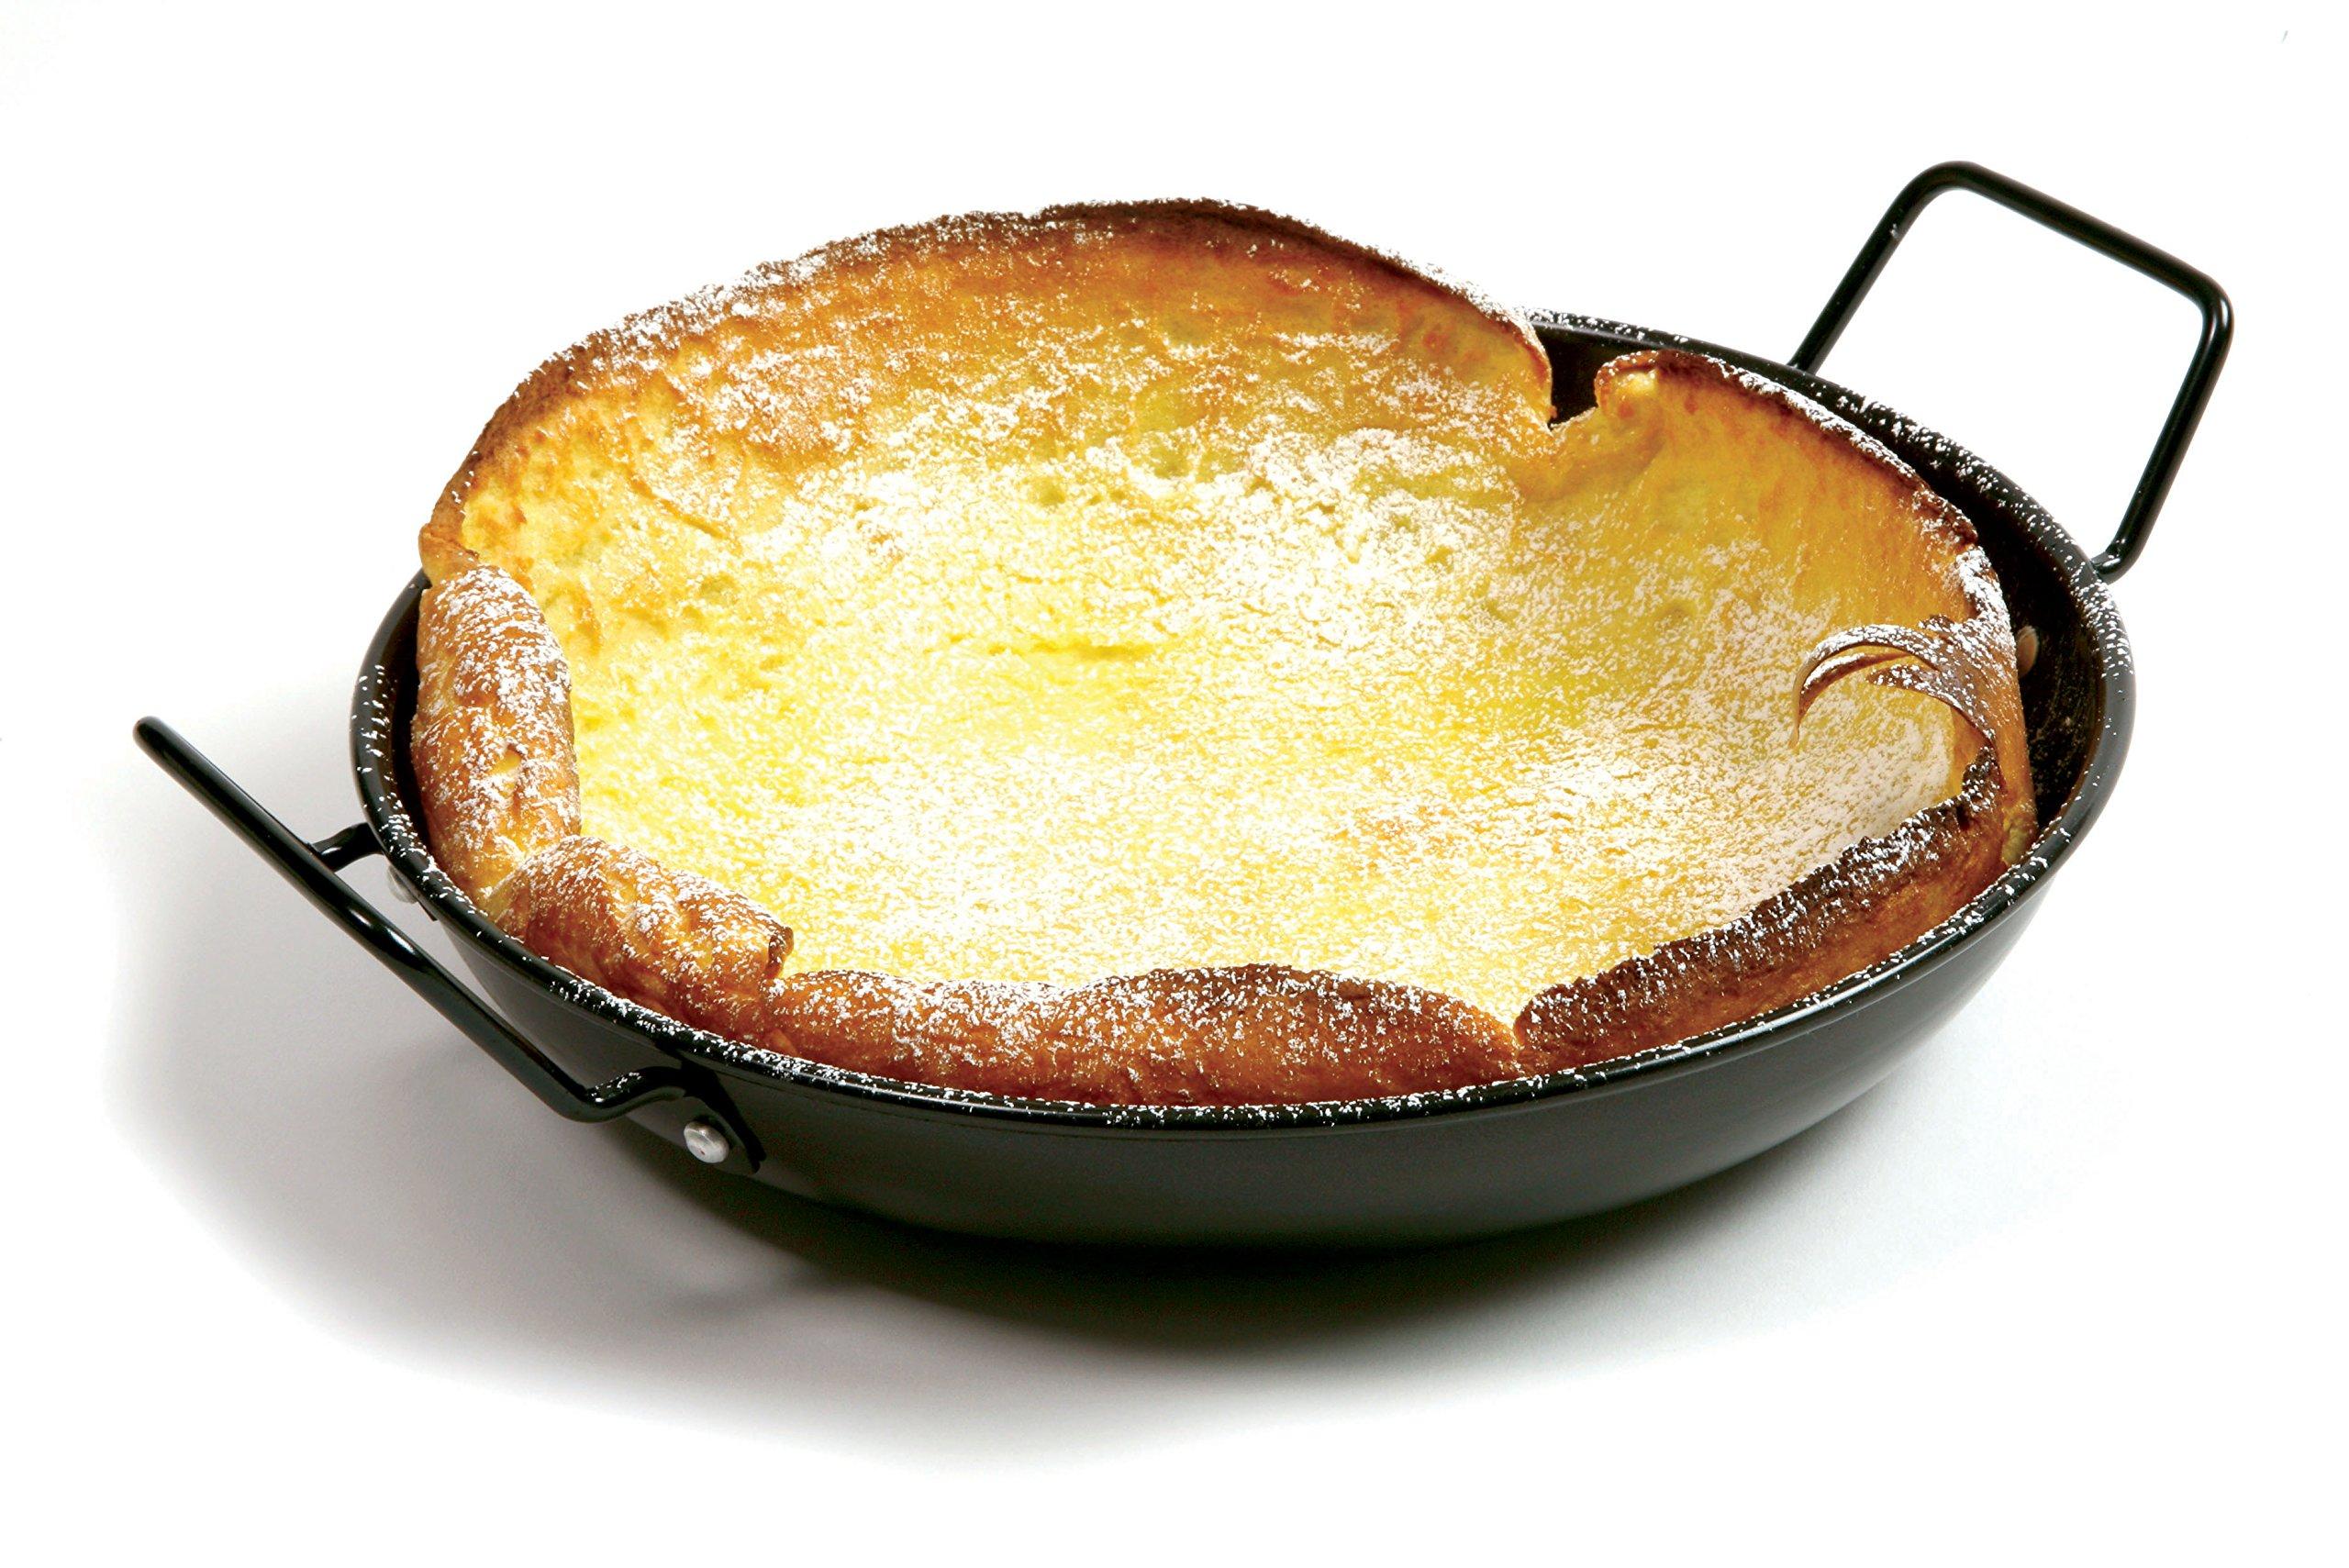 Norpro Nonstick Oven Dutch Baby/Paella Pancake Omelet Crepe Pan 11.5'' New